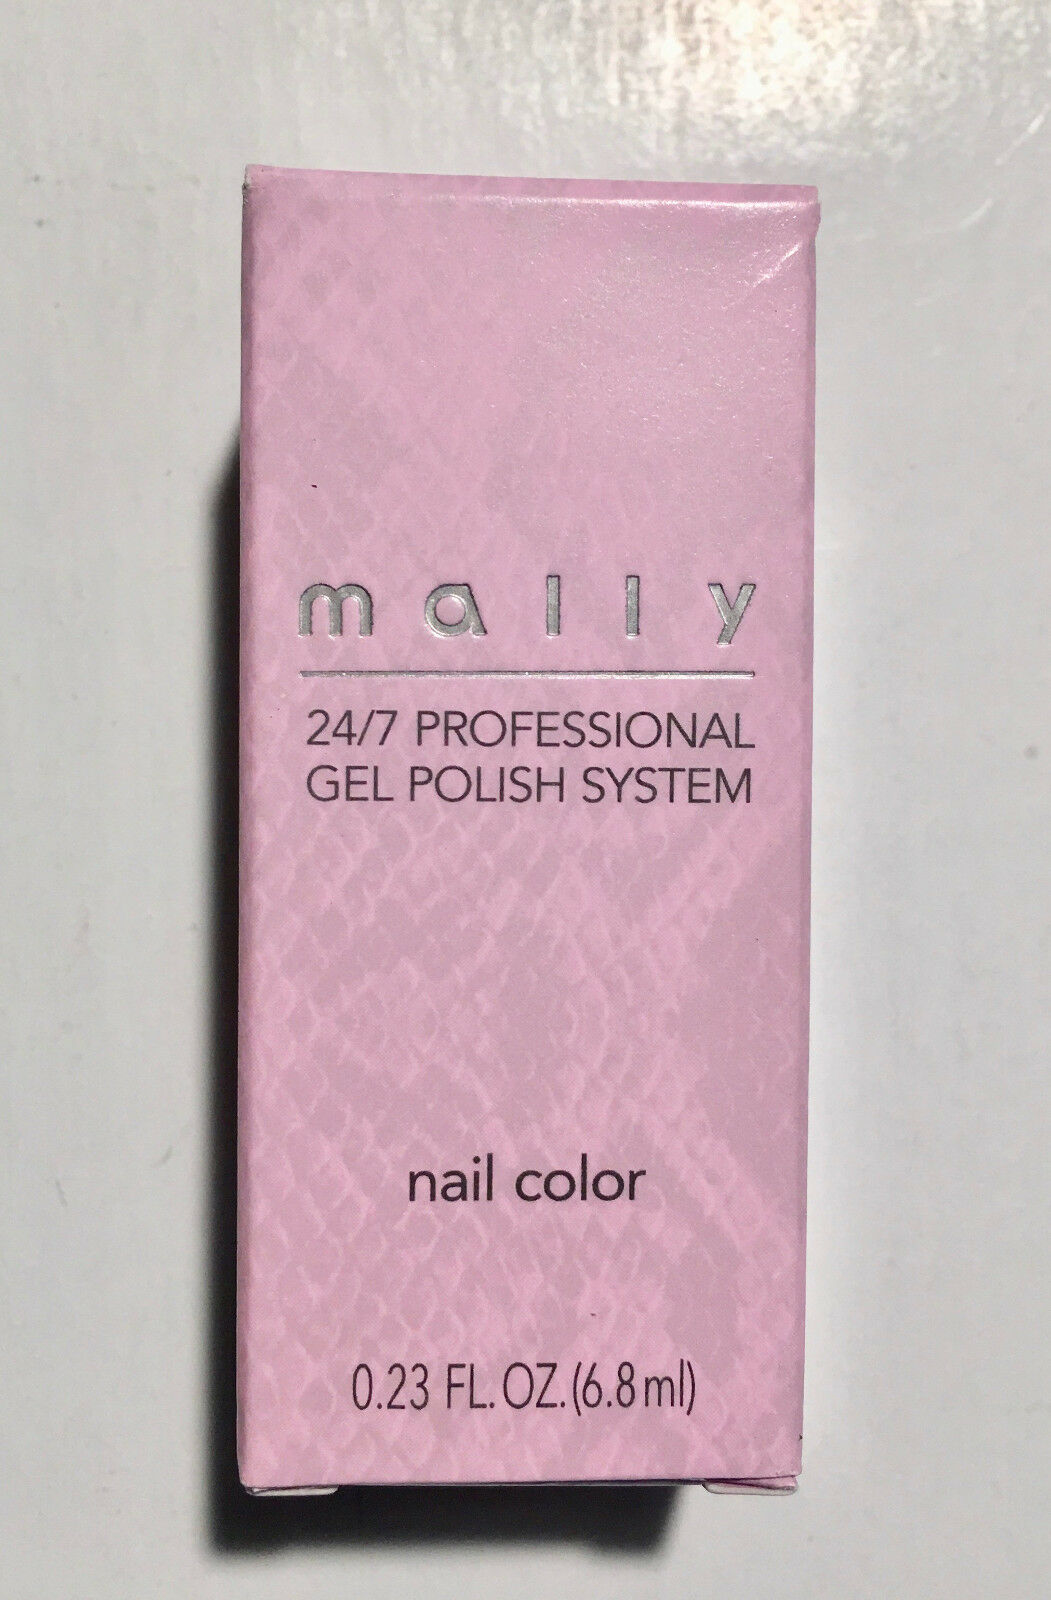 Mally 24/7 Pro GEL Polish Nail Color Like a Virgin Neutral Beige ...